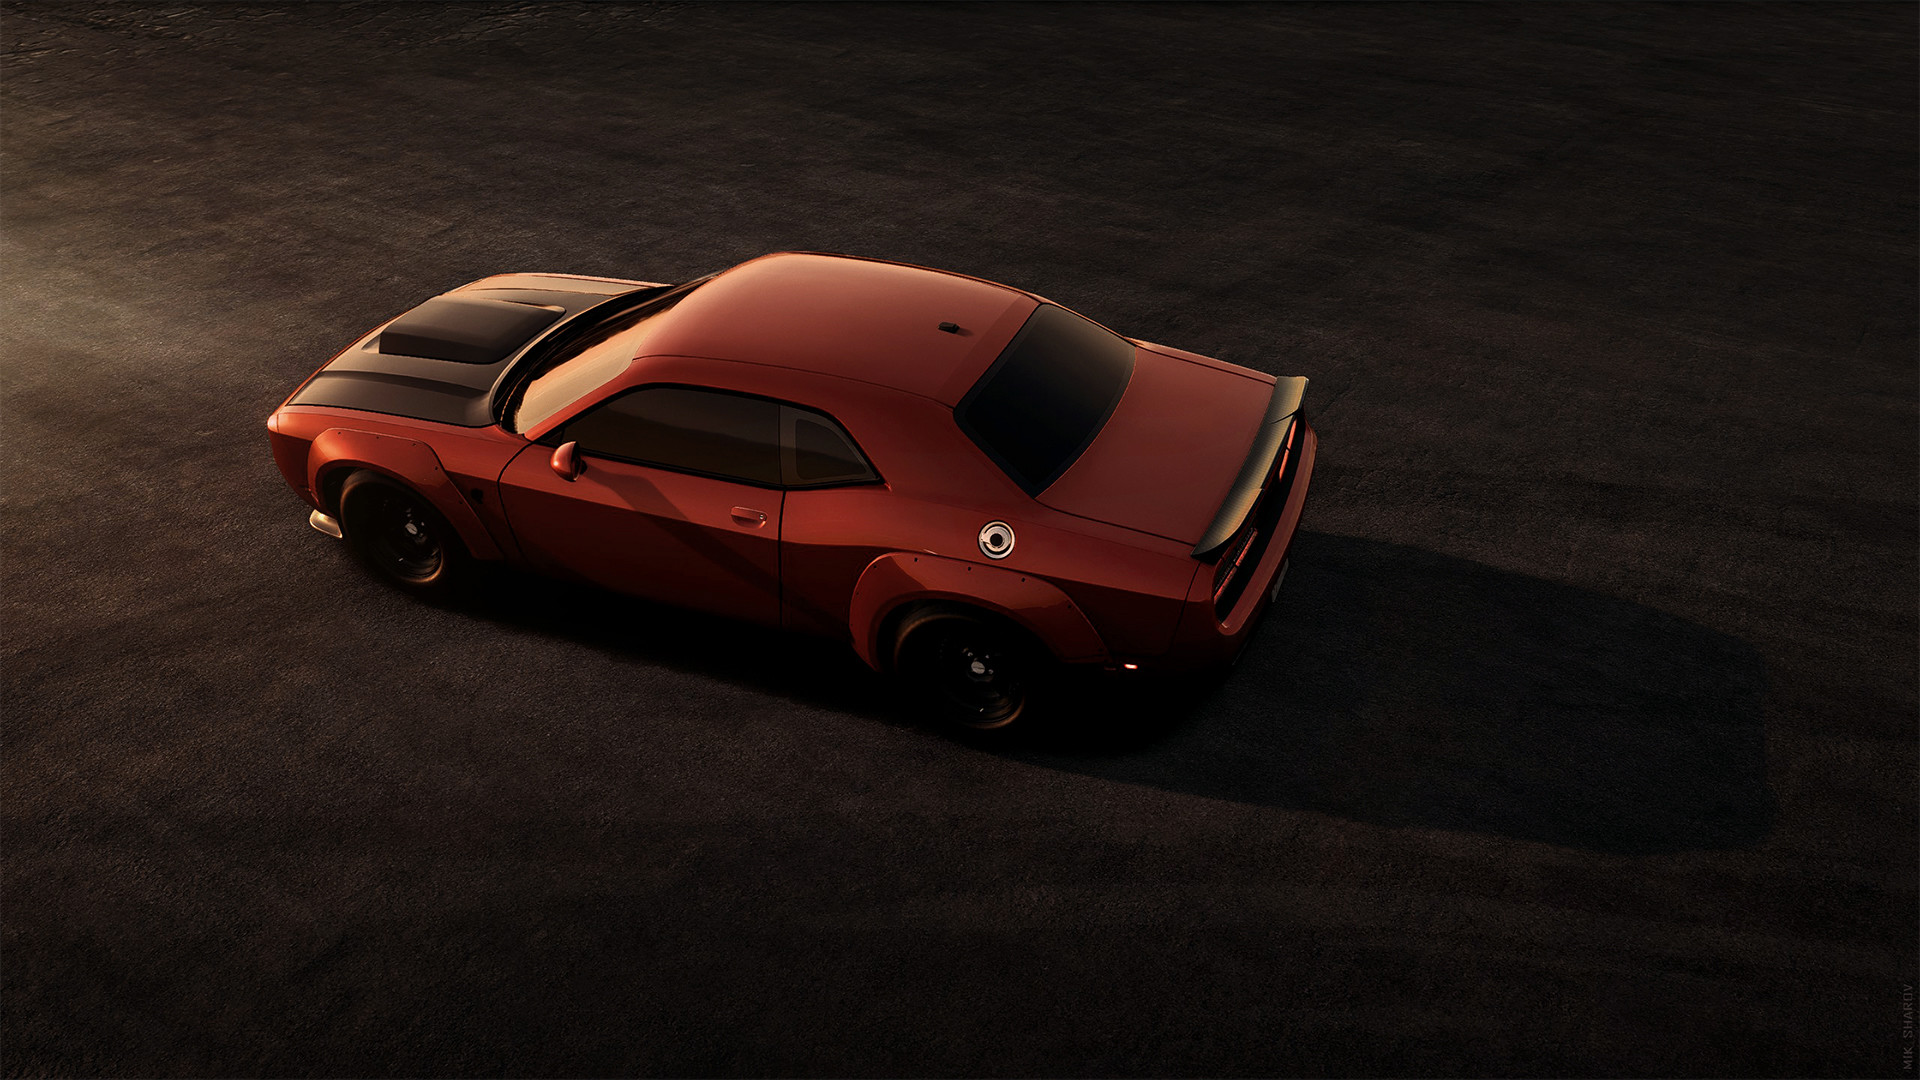 sport edition dodge challenger texture minimalism machine challenger classic car widebody orange car srt dodge sport  sports car